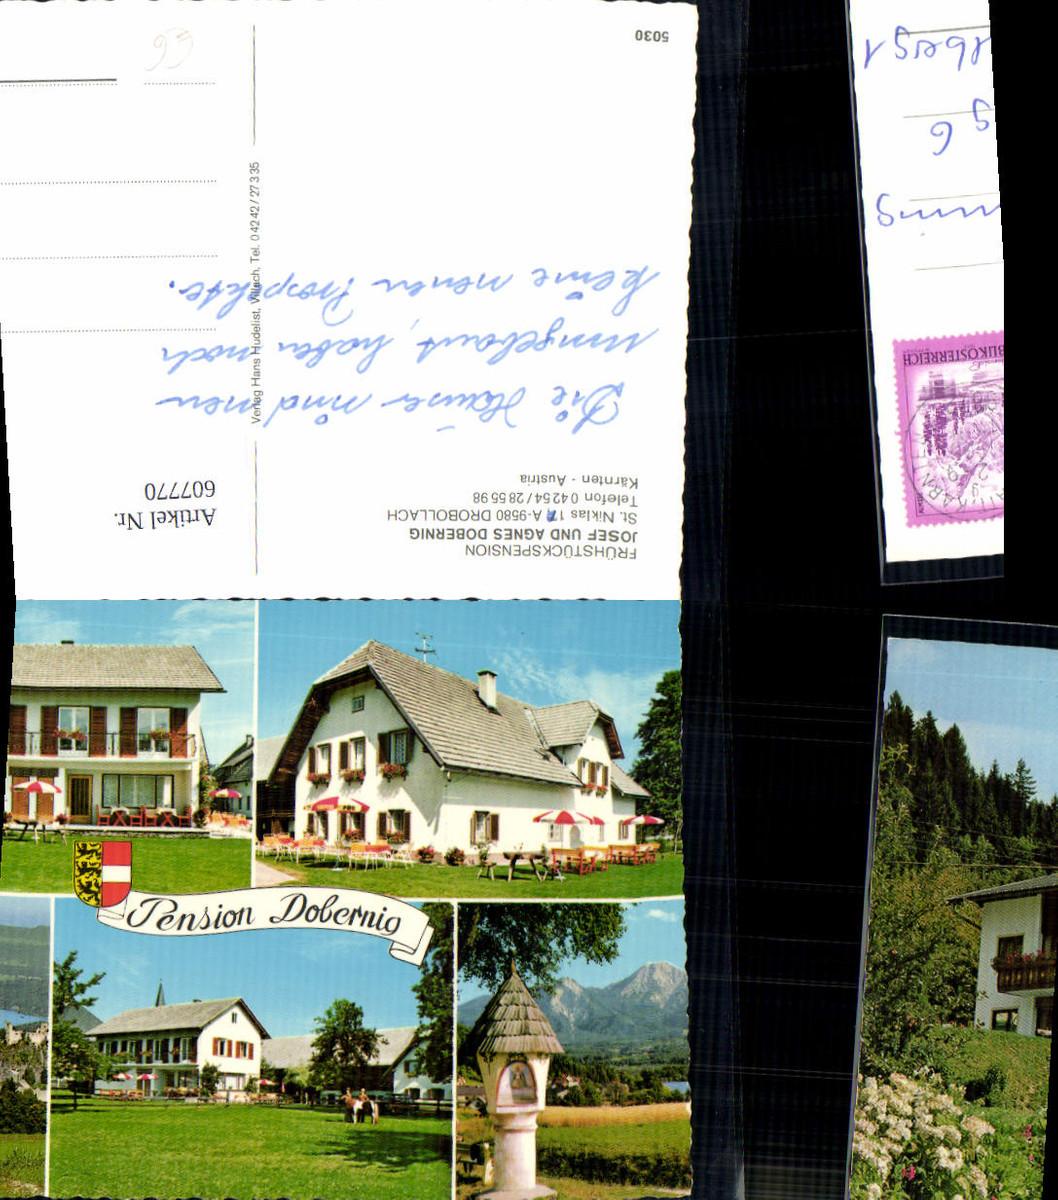 607770,St Niklas Drobollach Frühstückspension Dobernig Marterl Bildstock günstig online kaufen